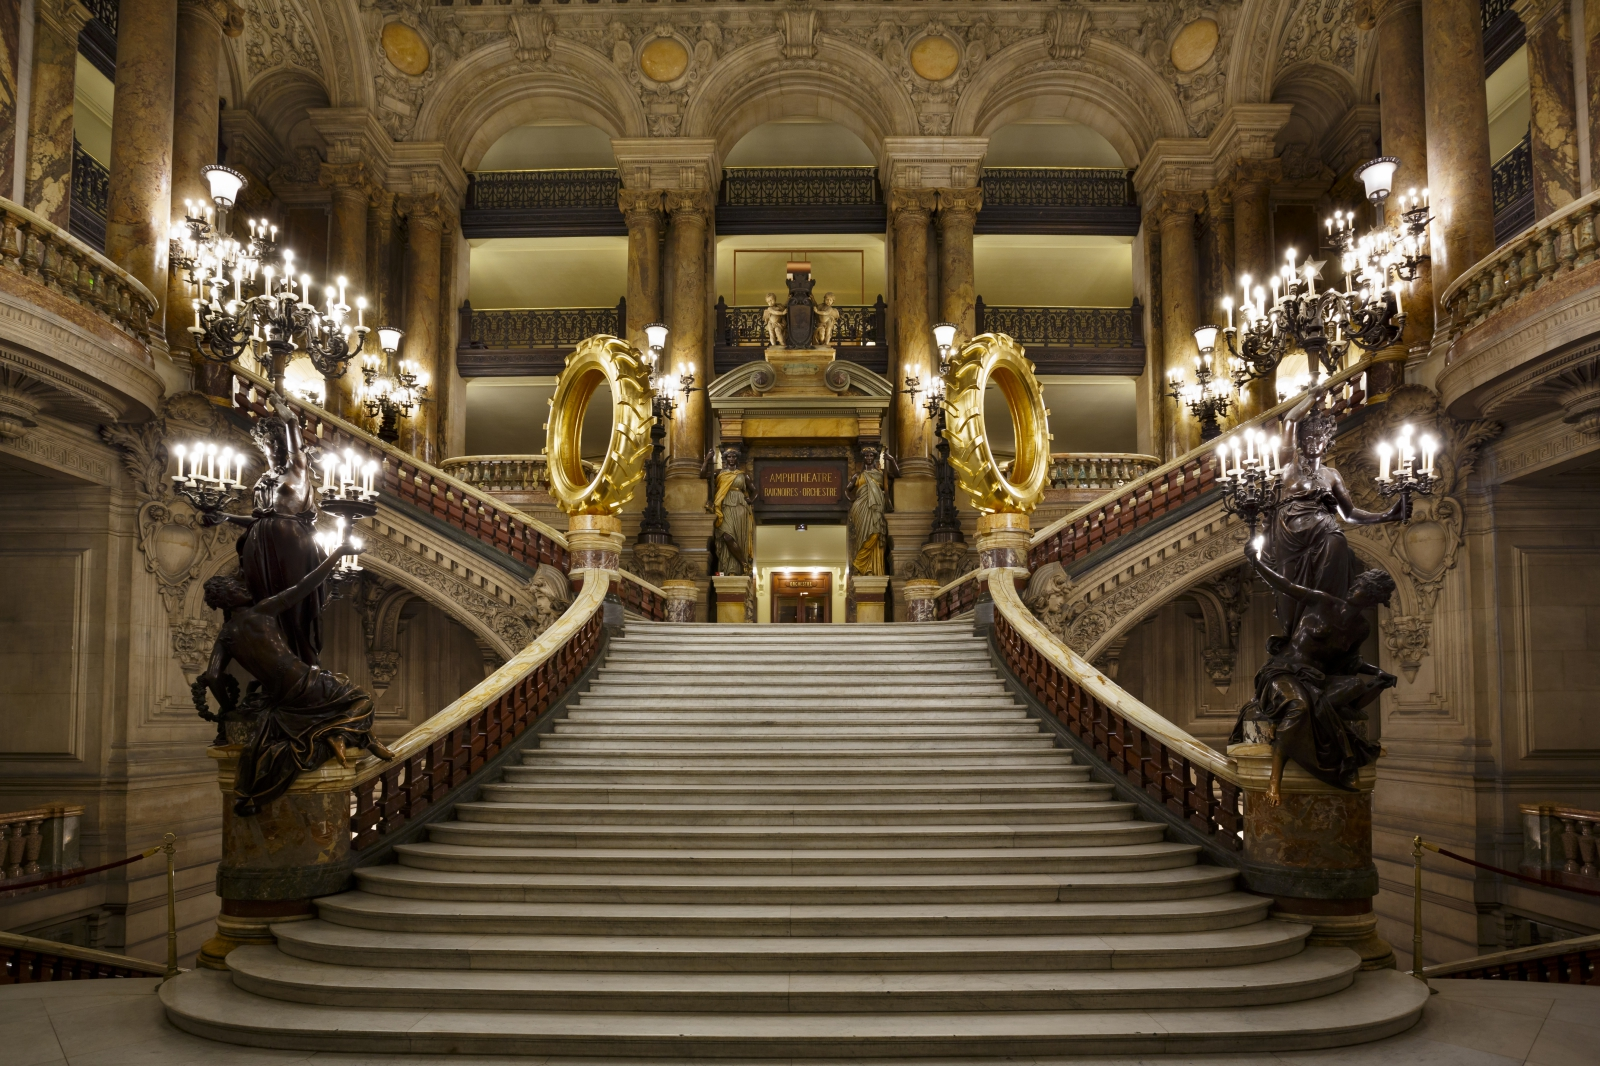 Visit Paris - Opera Garnier Guided tour - The Paris Opera